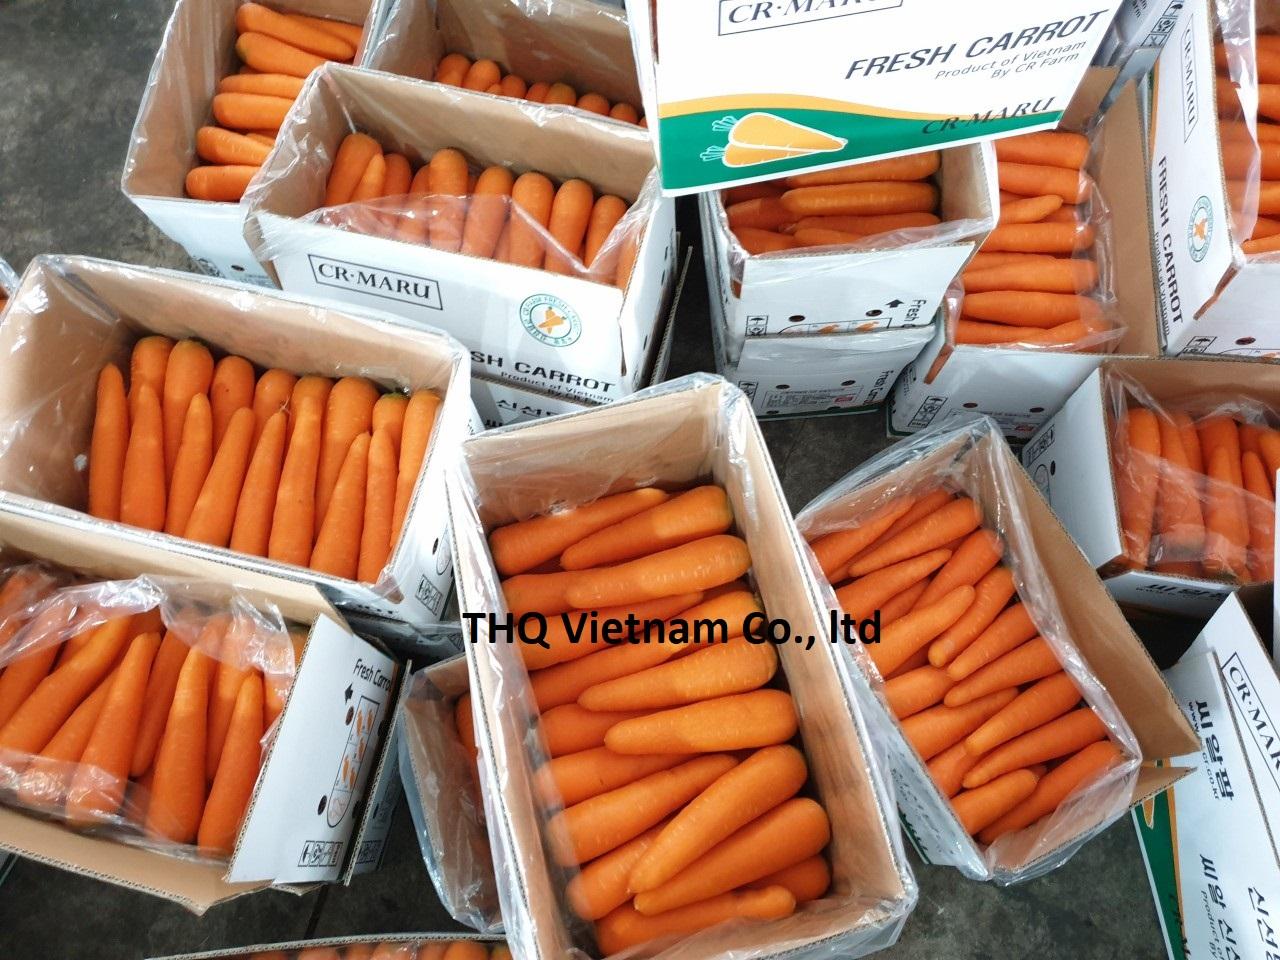 Fresh Carrot From Vietnam